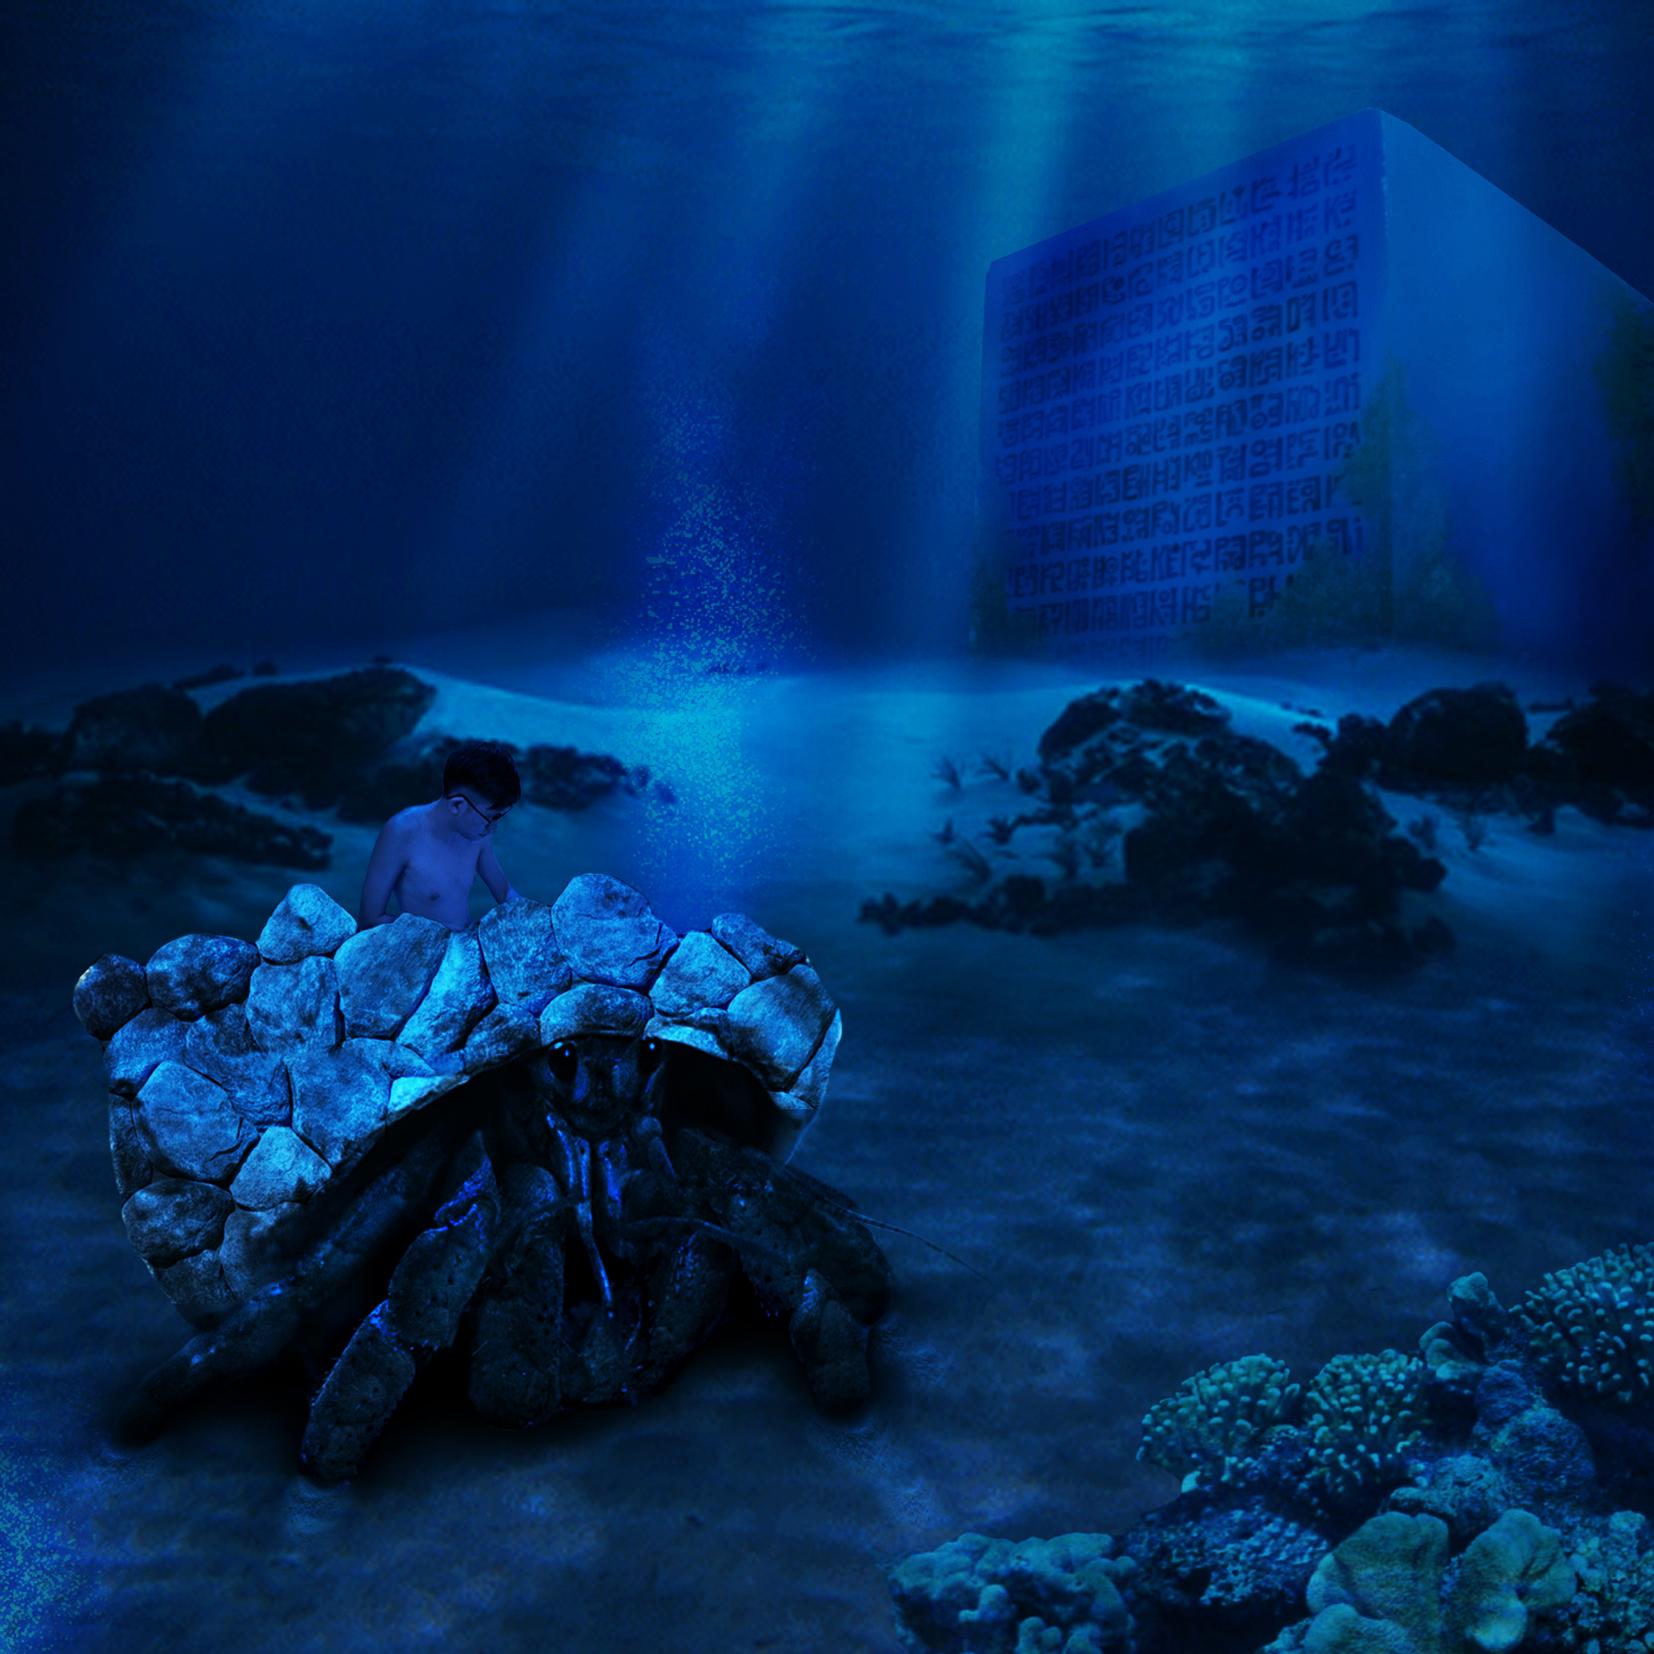 Poneglyph of Fishman Island Digital Art by Alvin Sim